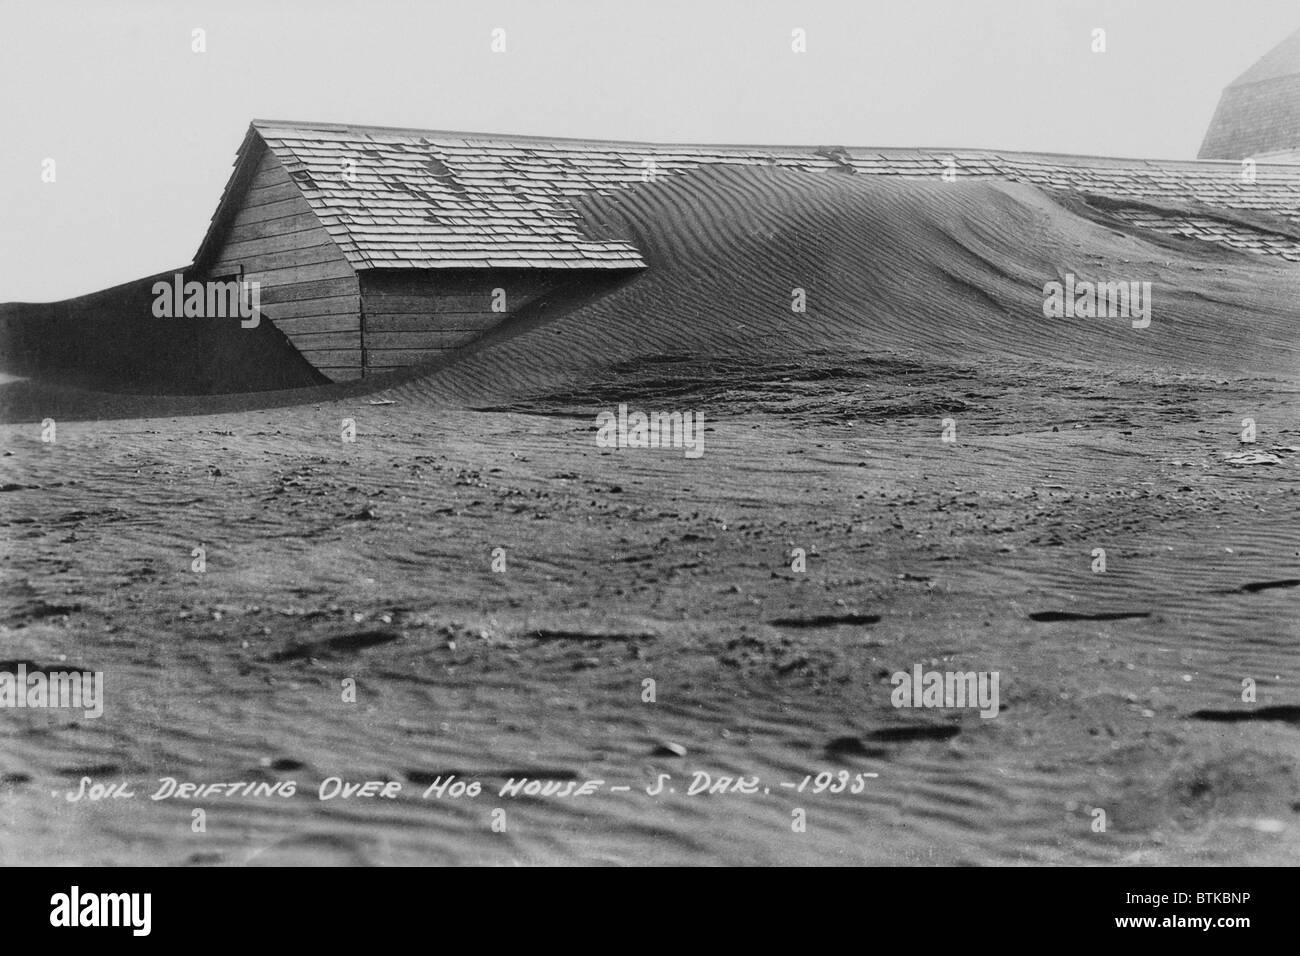 Soil drifting over a farm building on a South Dakota farm in 1935. Dakota was north of the 'Dust Bowl,' - Stock Image